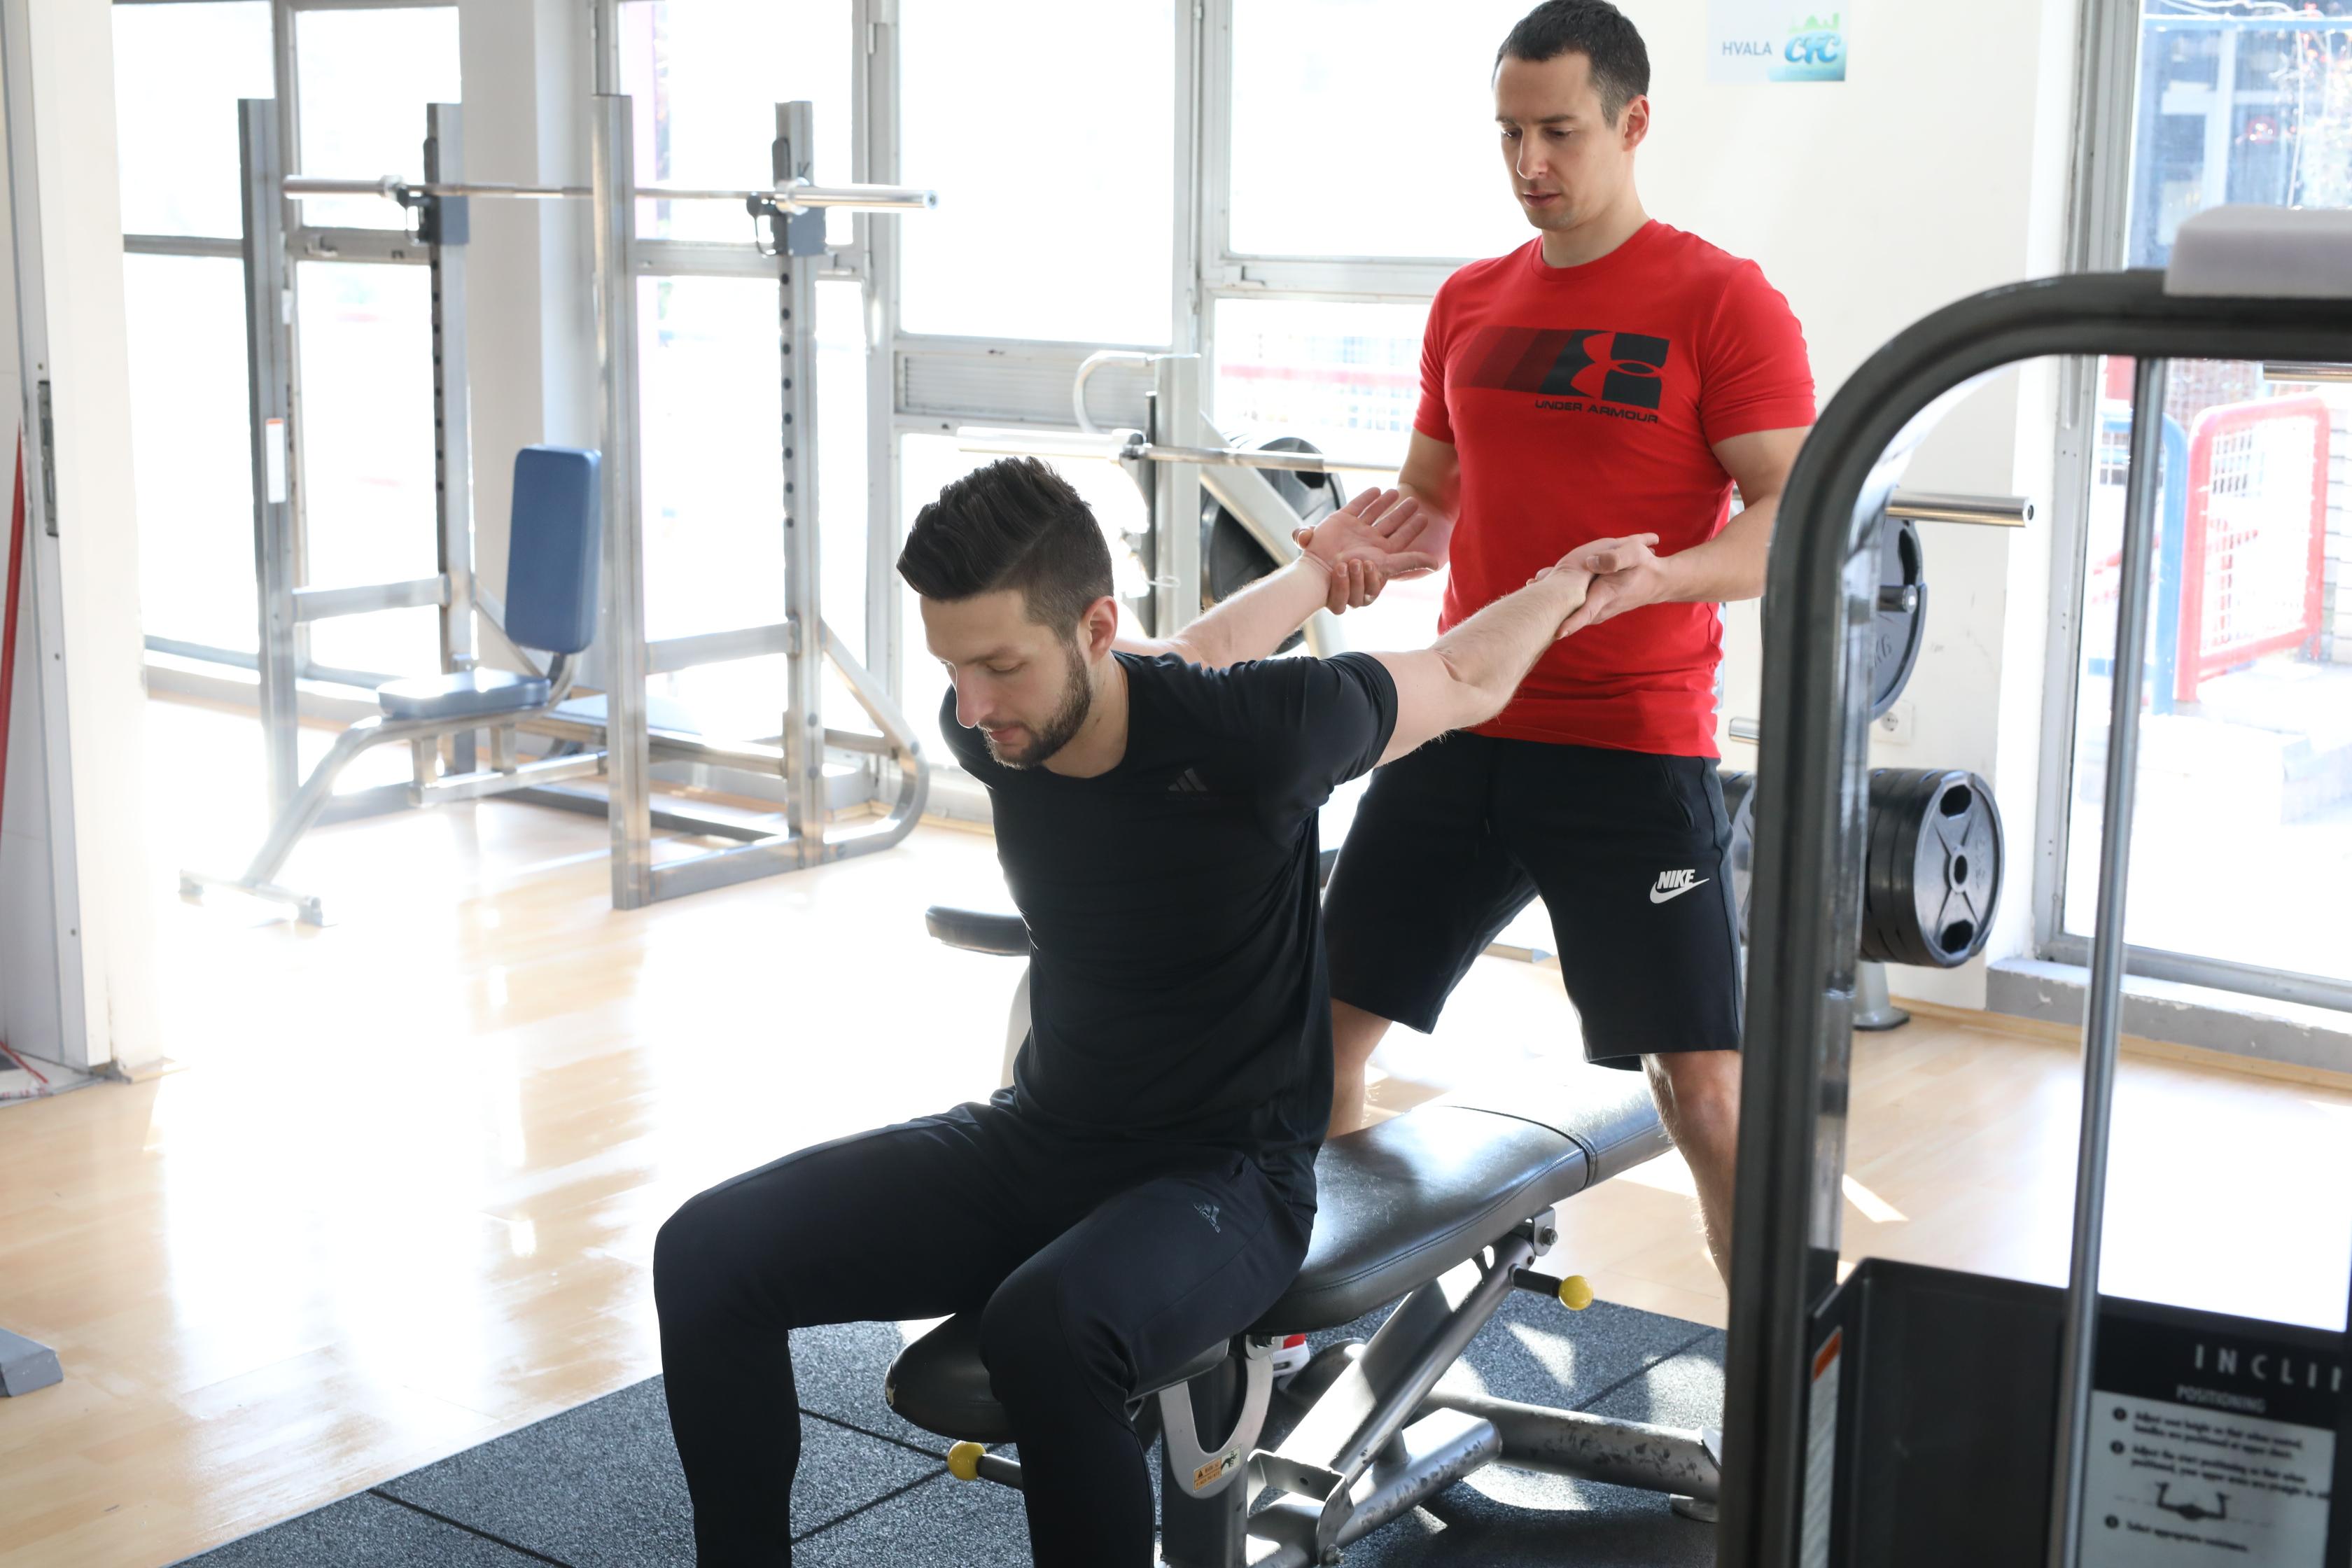 Redovna fizička aktivnost - ključ dobrog zdravlja